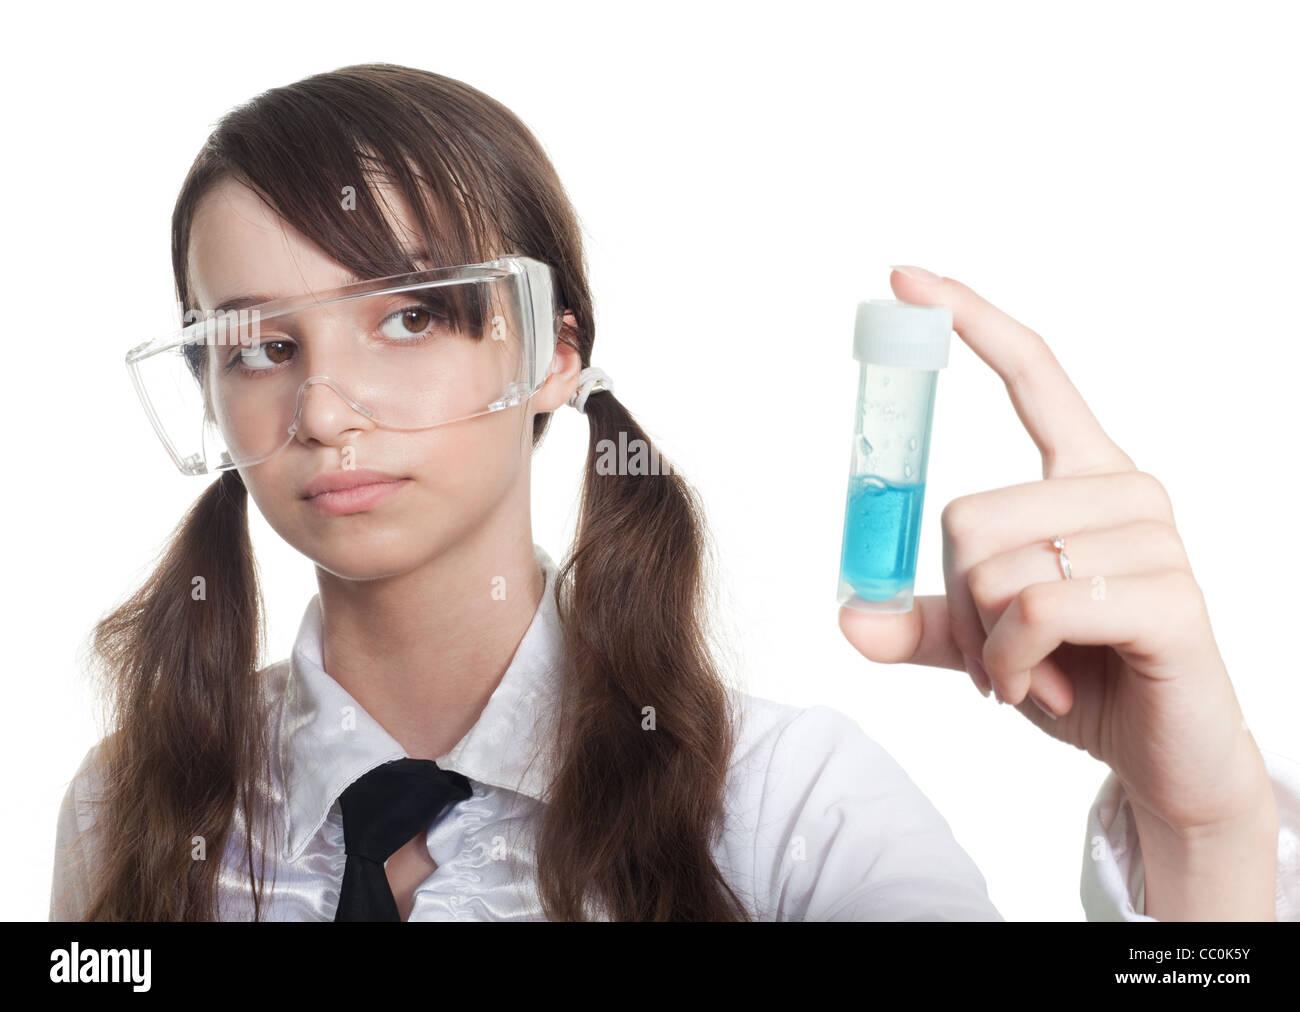 the-test-tube-teen